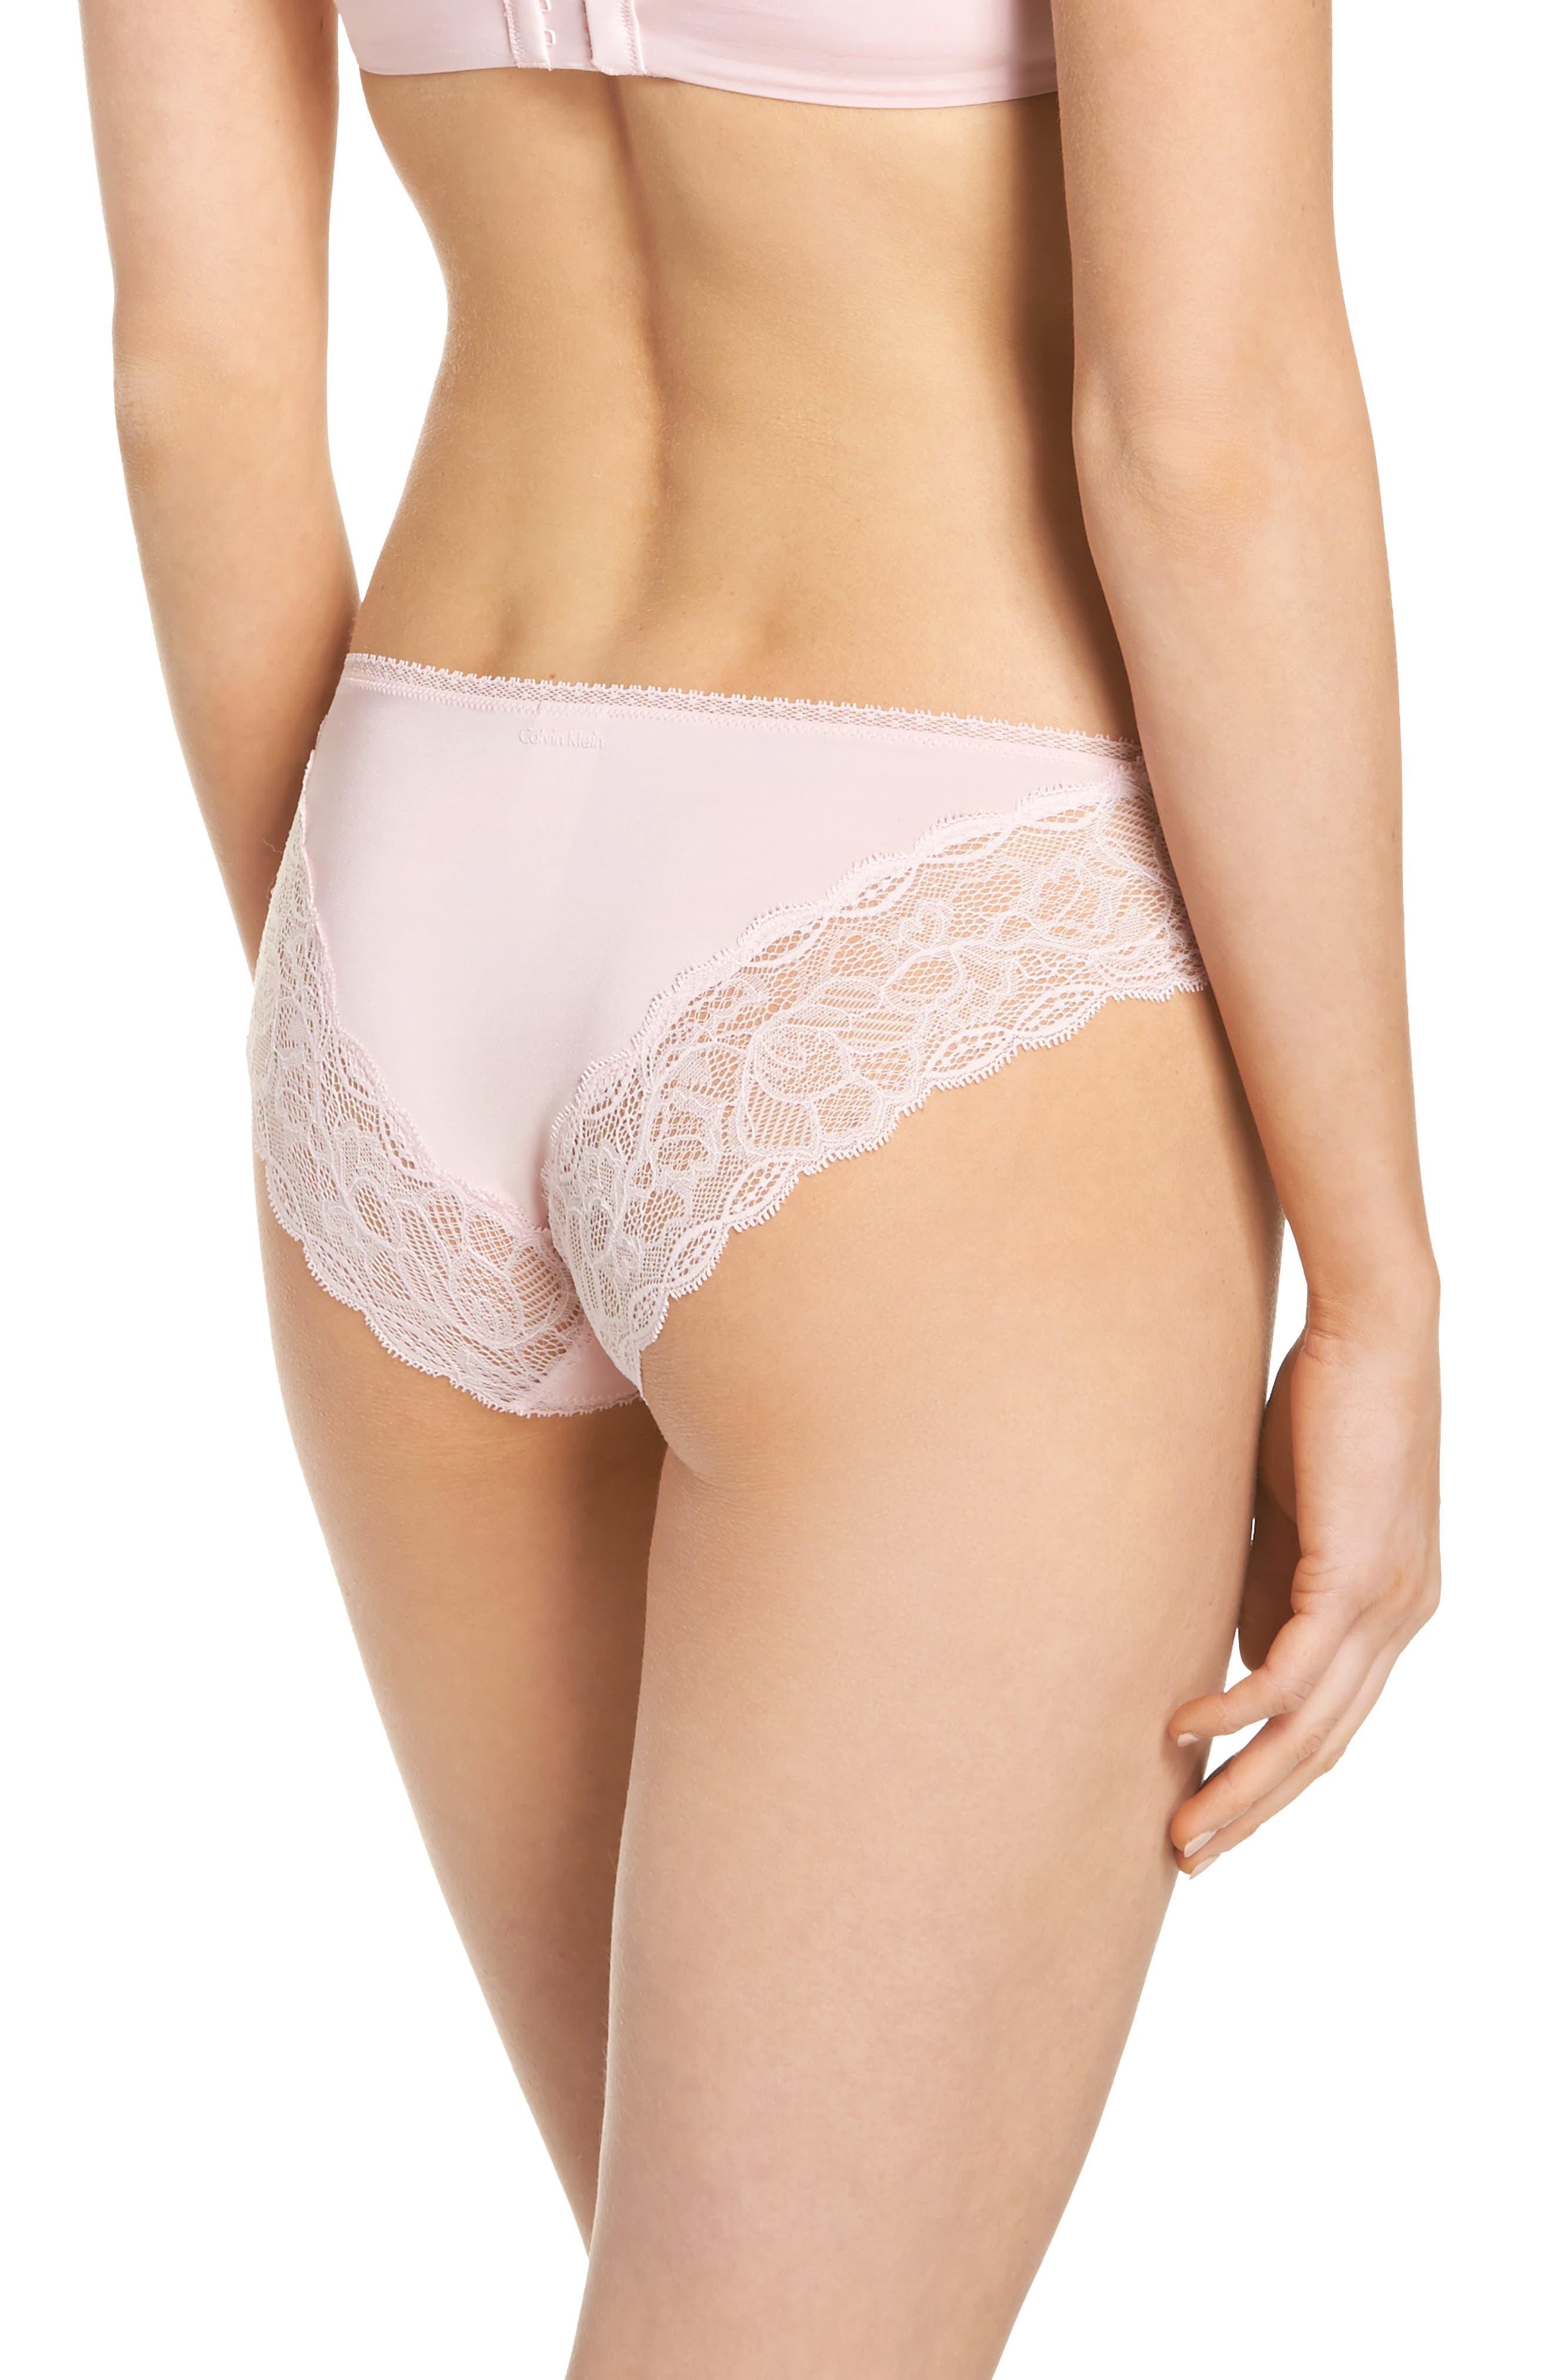 Seductive Comfort Lace Bikini,                             Alternate thumbnail 2, color,                             Attract